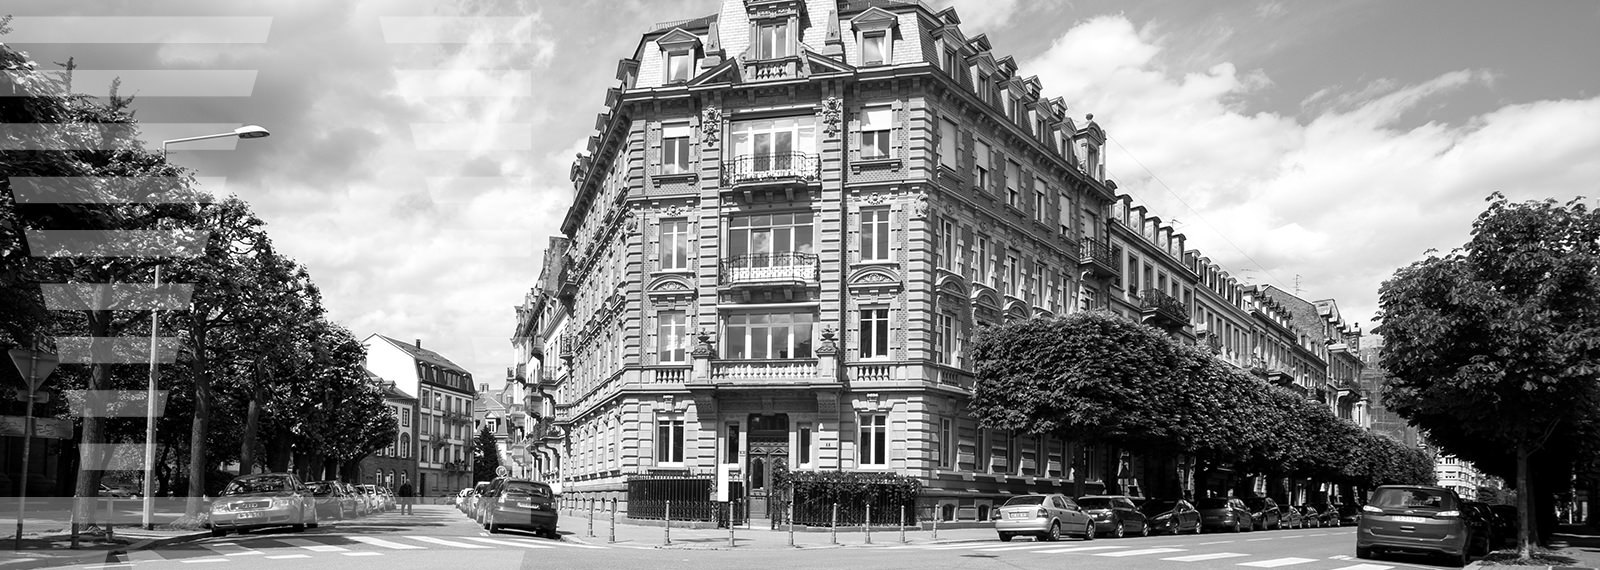 Groupement strasbourgeois d 39 avocats - Cabinet conseil strasbourg ...